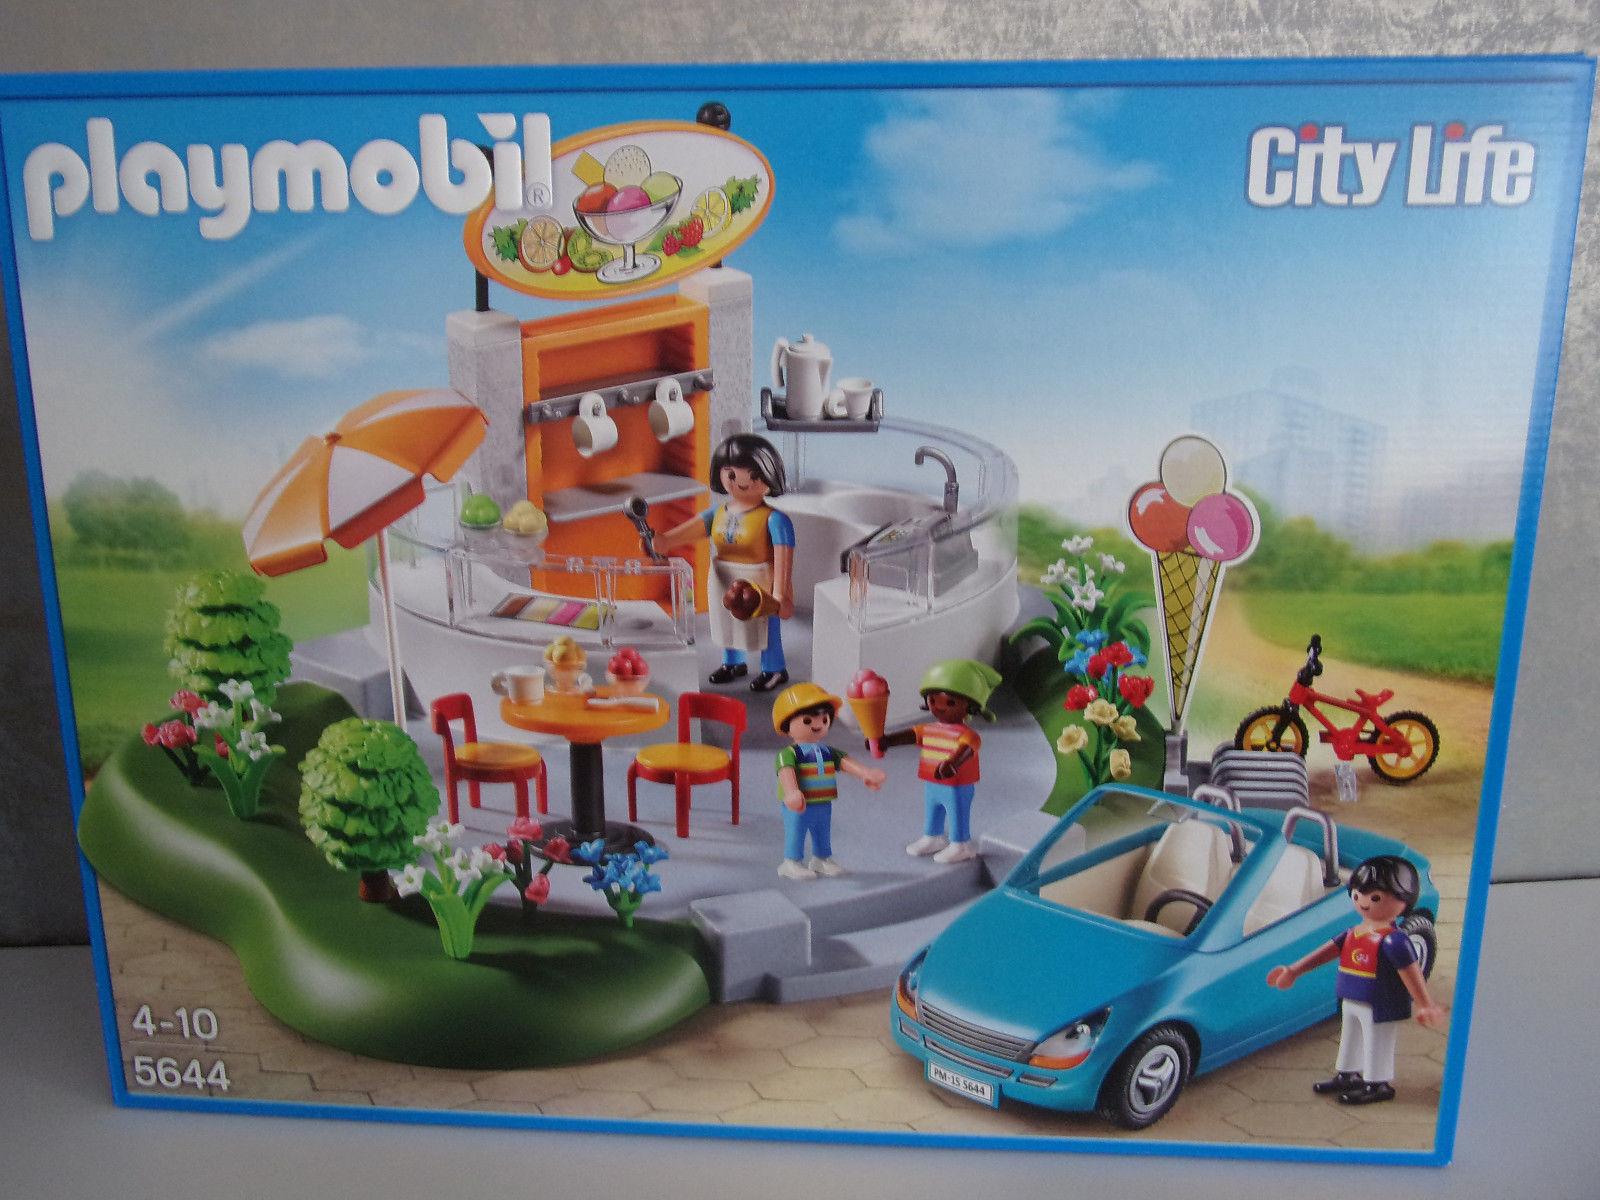 Playmobil eisdiele amazon